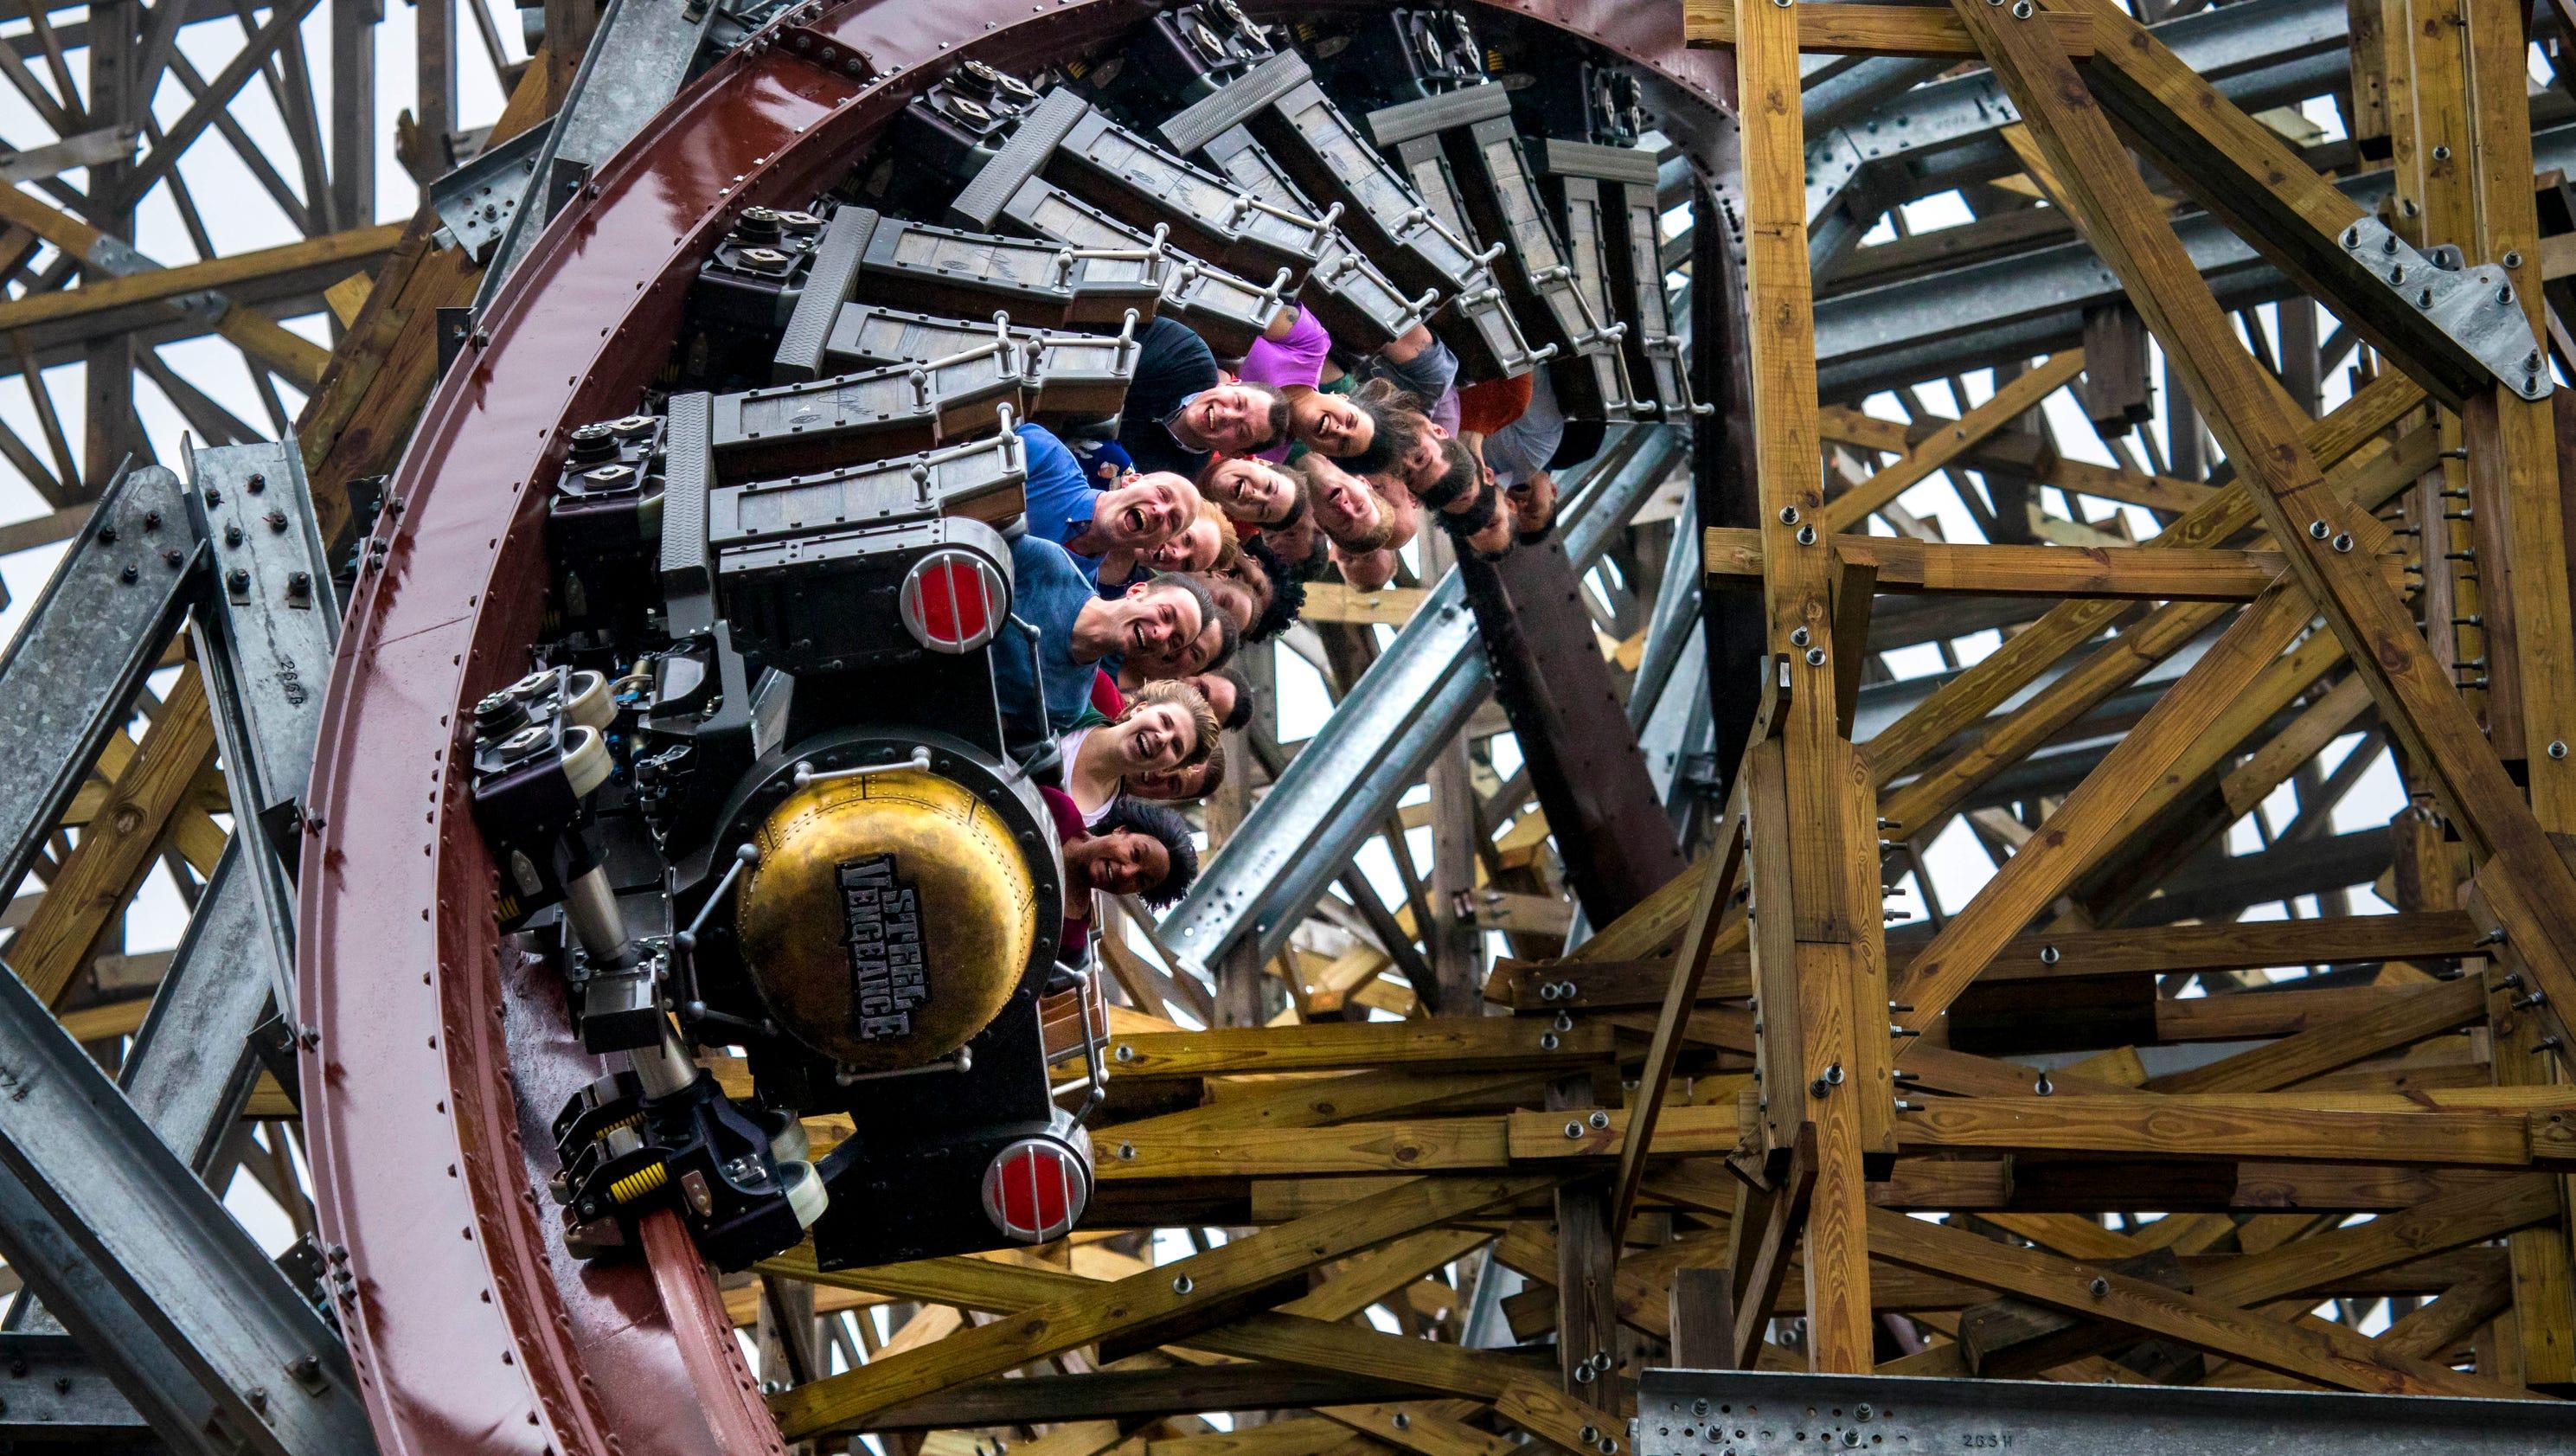 Cedar Point's new Steel Vengeance coaster adds metal to